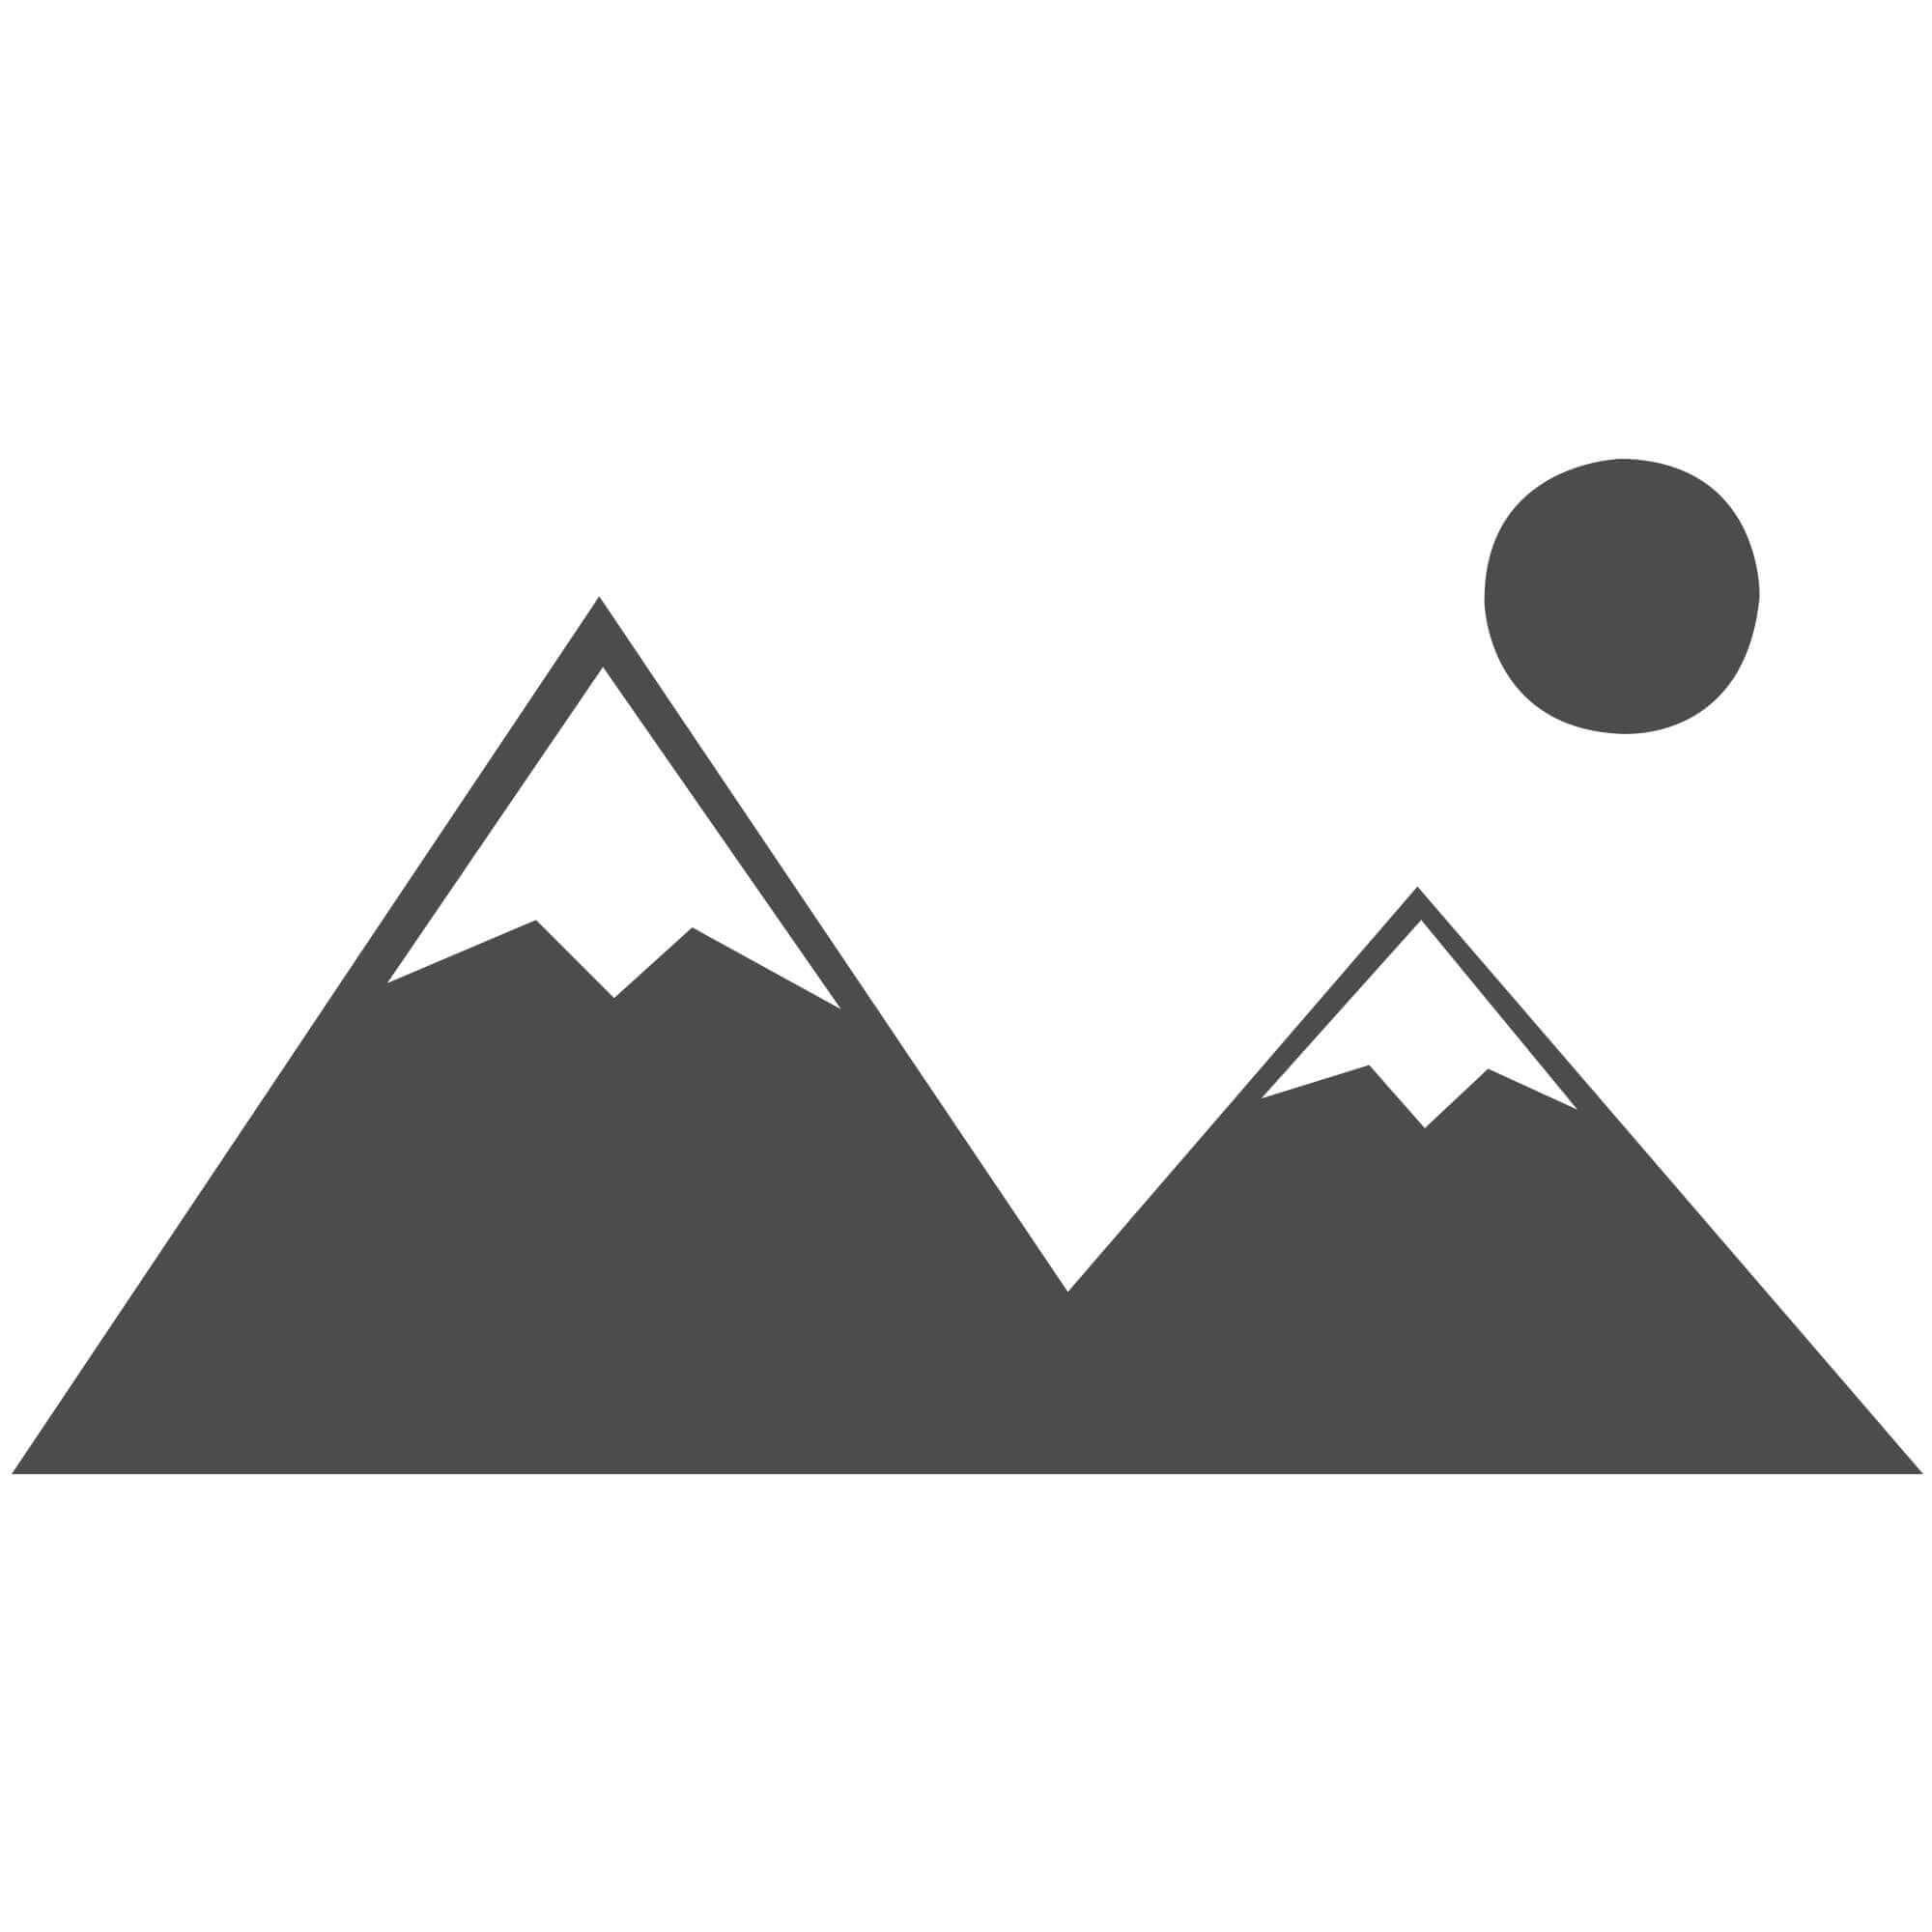 "Galleria Rug - Triangles 63263 5161 - Size 280 x 380 cm (9'2"" x 12'5"")"